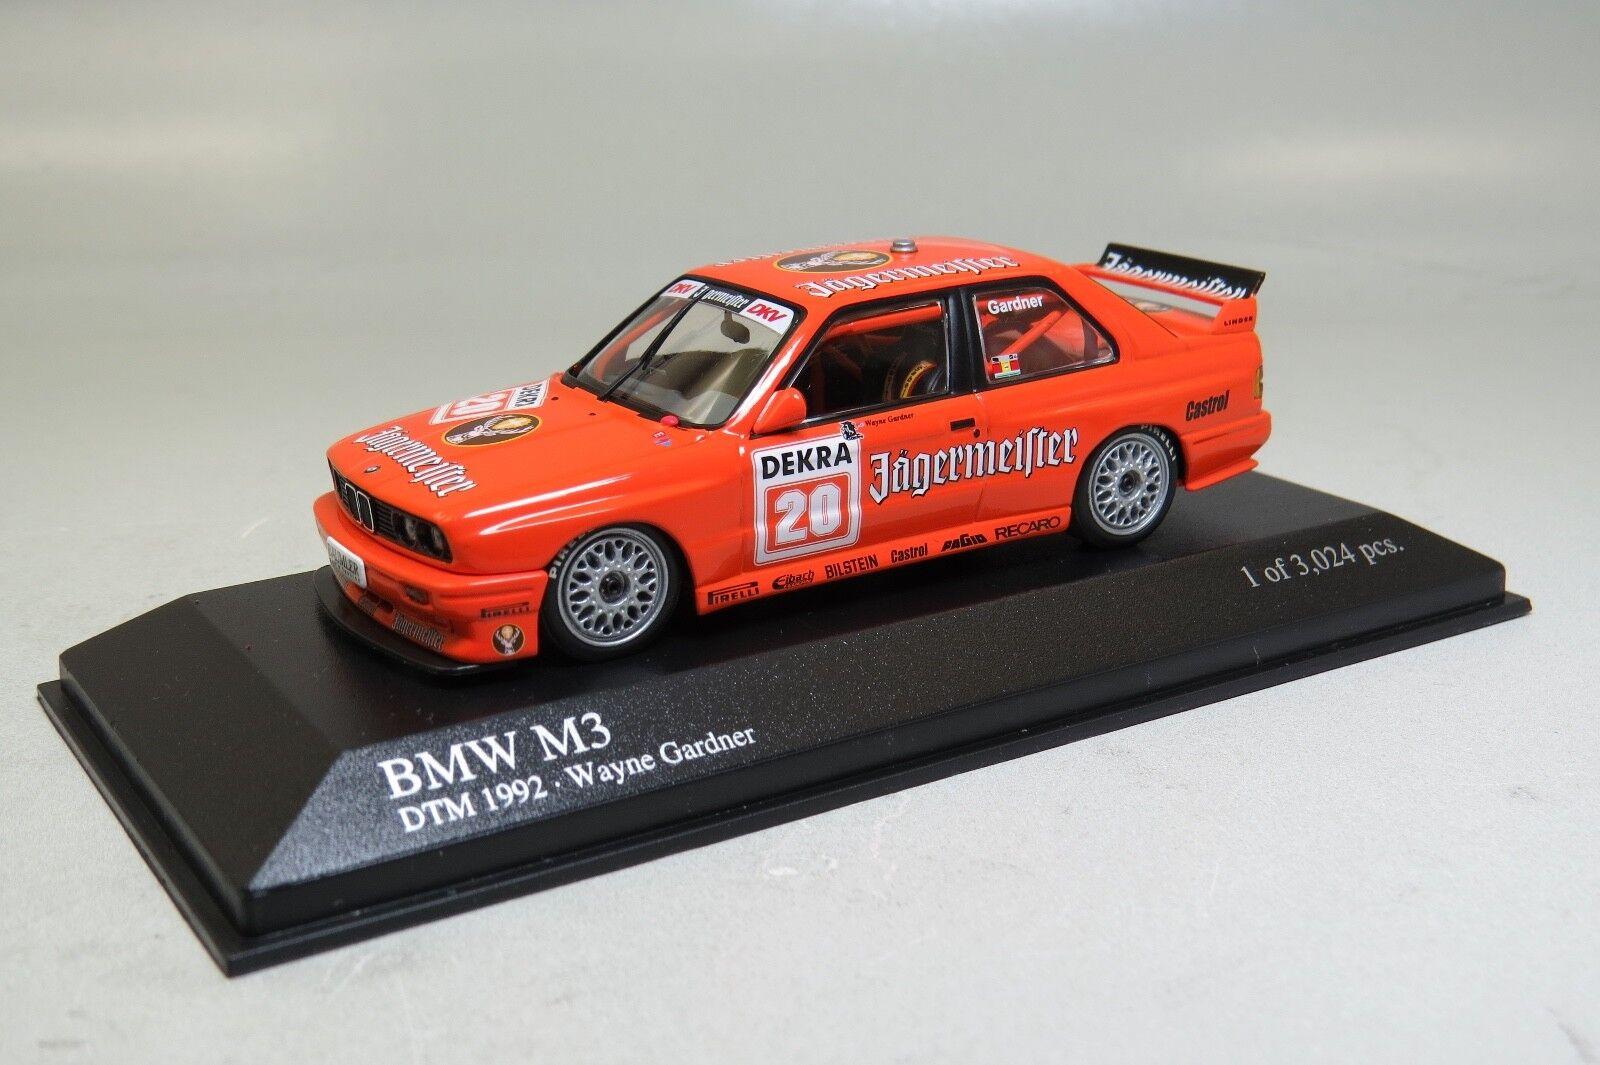 Minichamps BMW M3 DTM 1992 W.Gardner DTM 1992 1 43 430922020